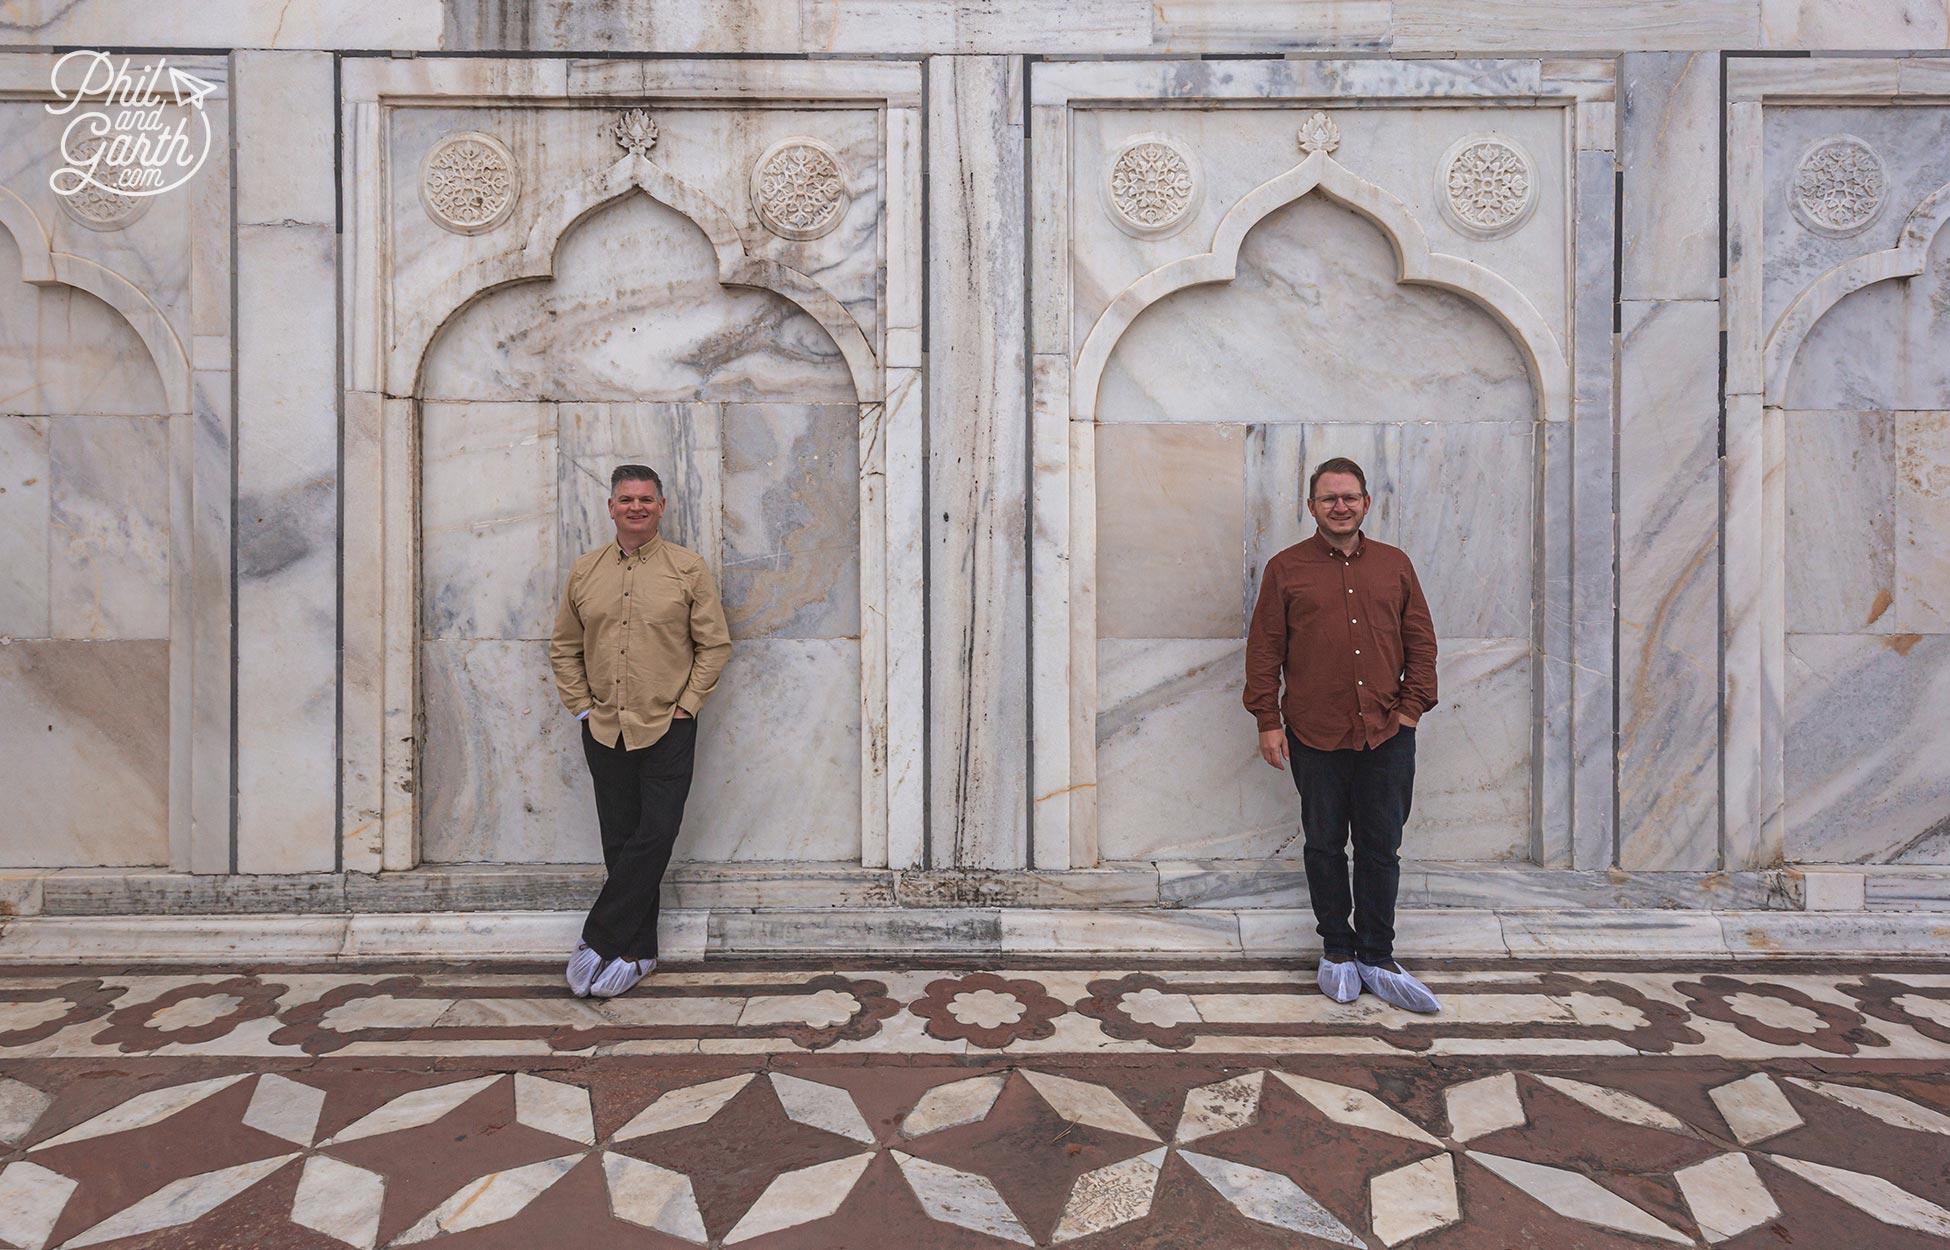 Phil and Garth stood next to a wall of the Taj Mahal